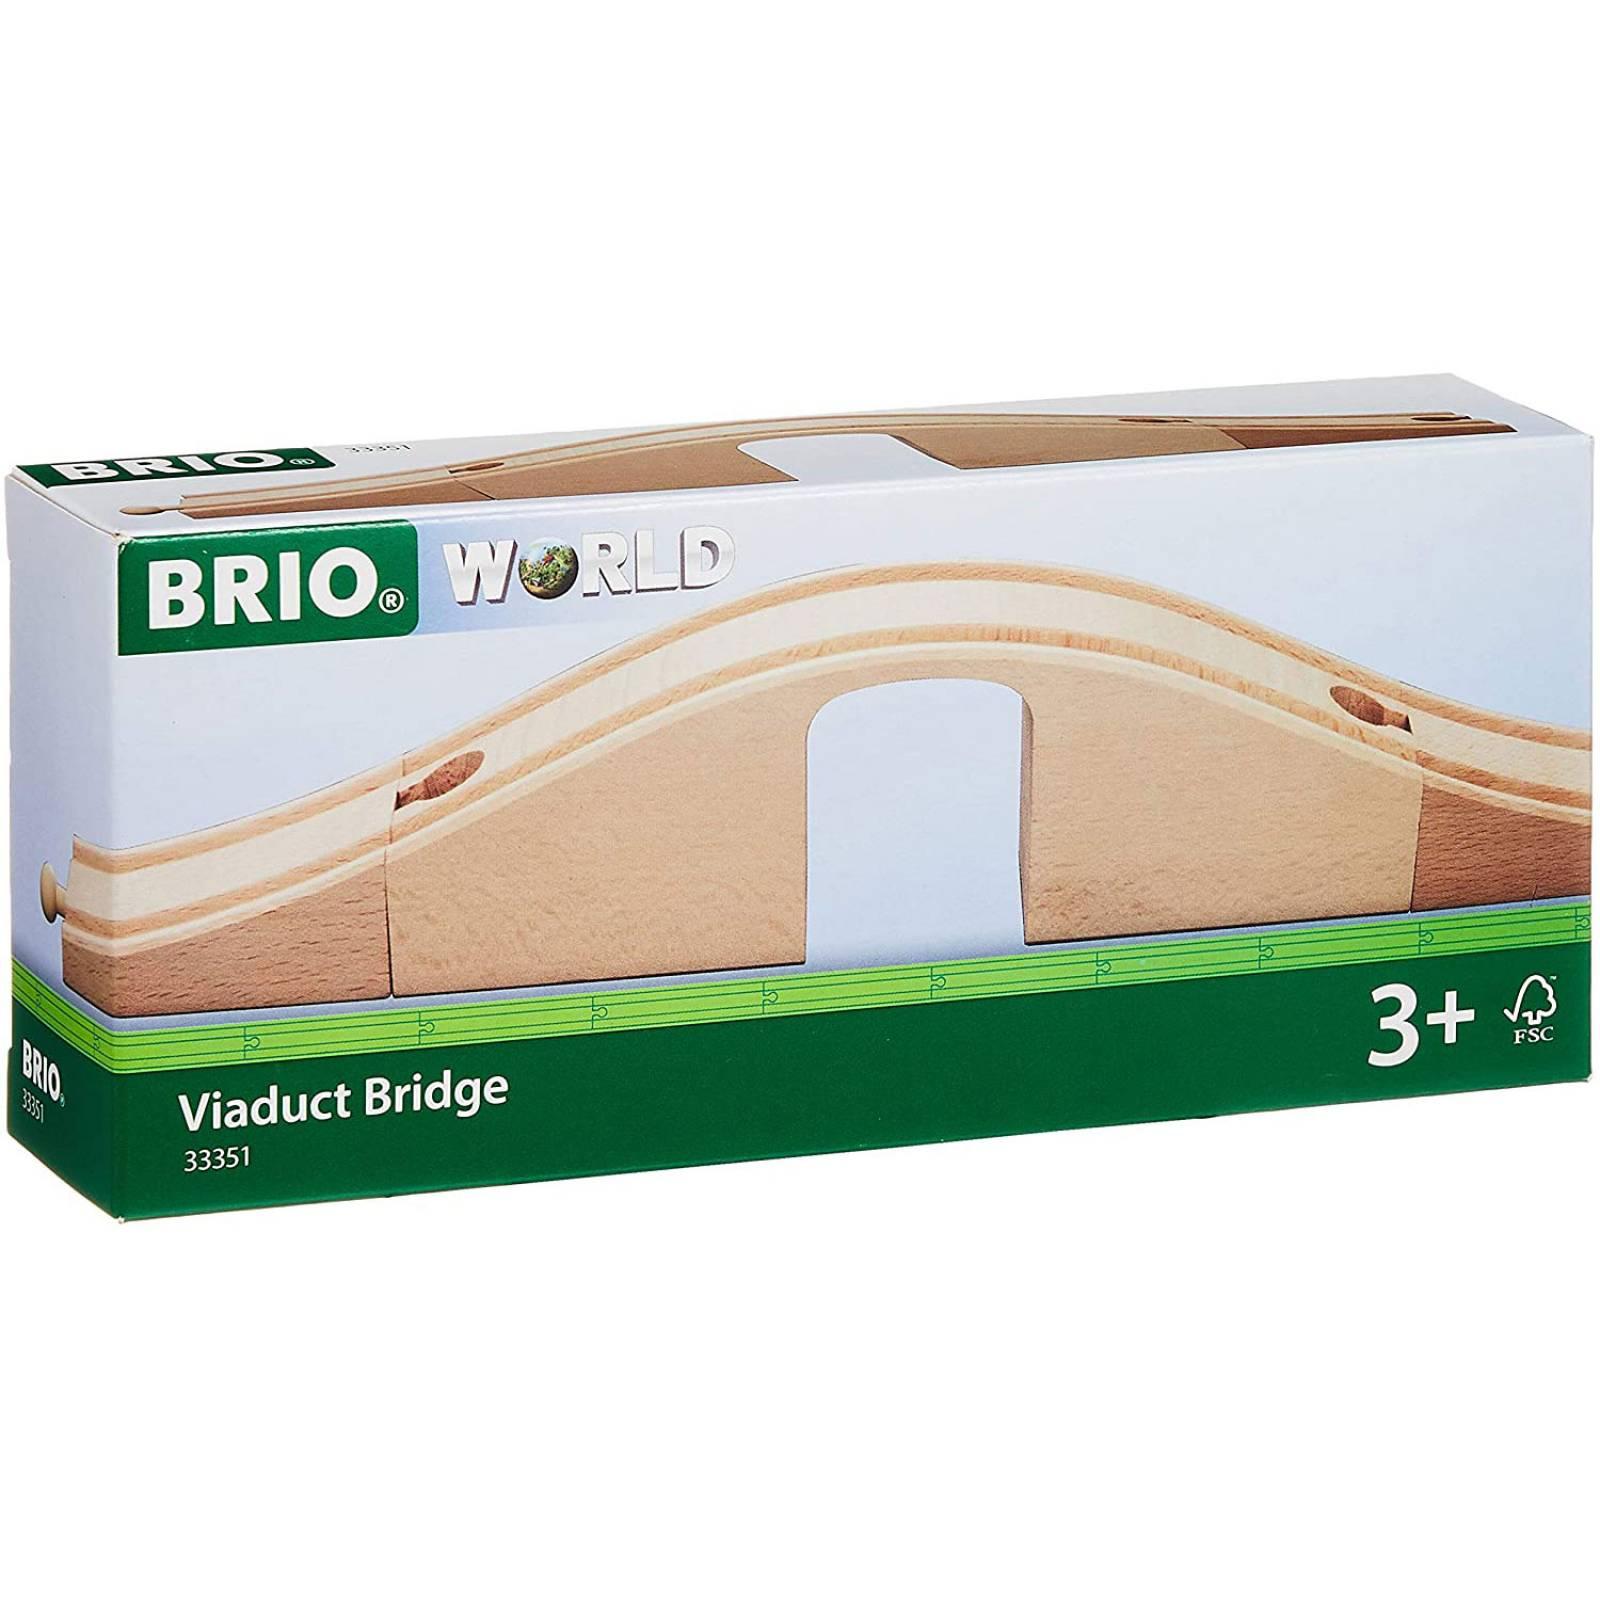 Viaduct Bridge BRIO Wooden Railway Age 3+ thumbnails